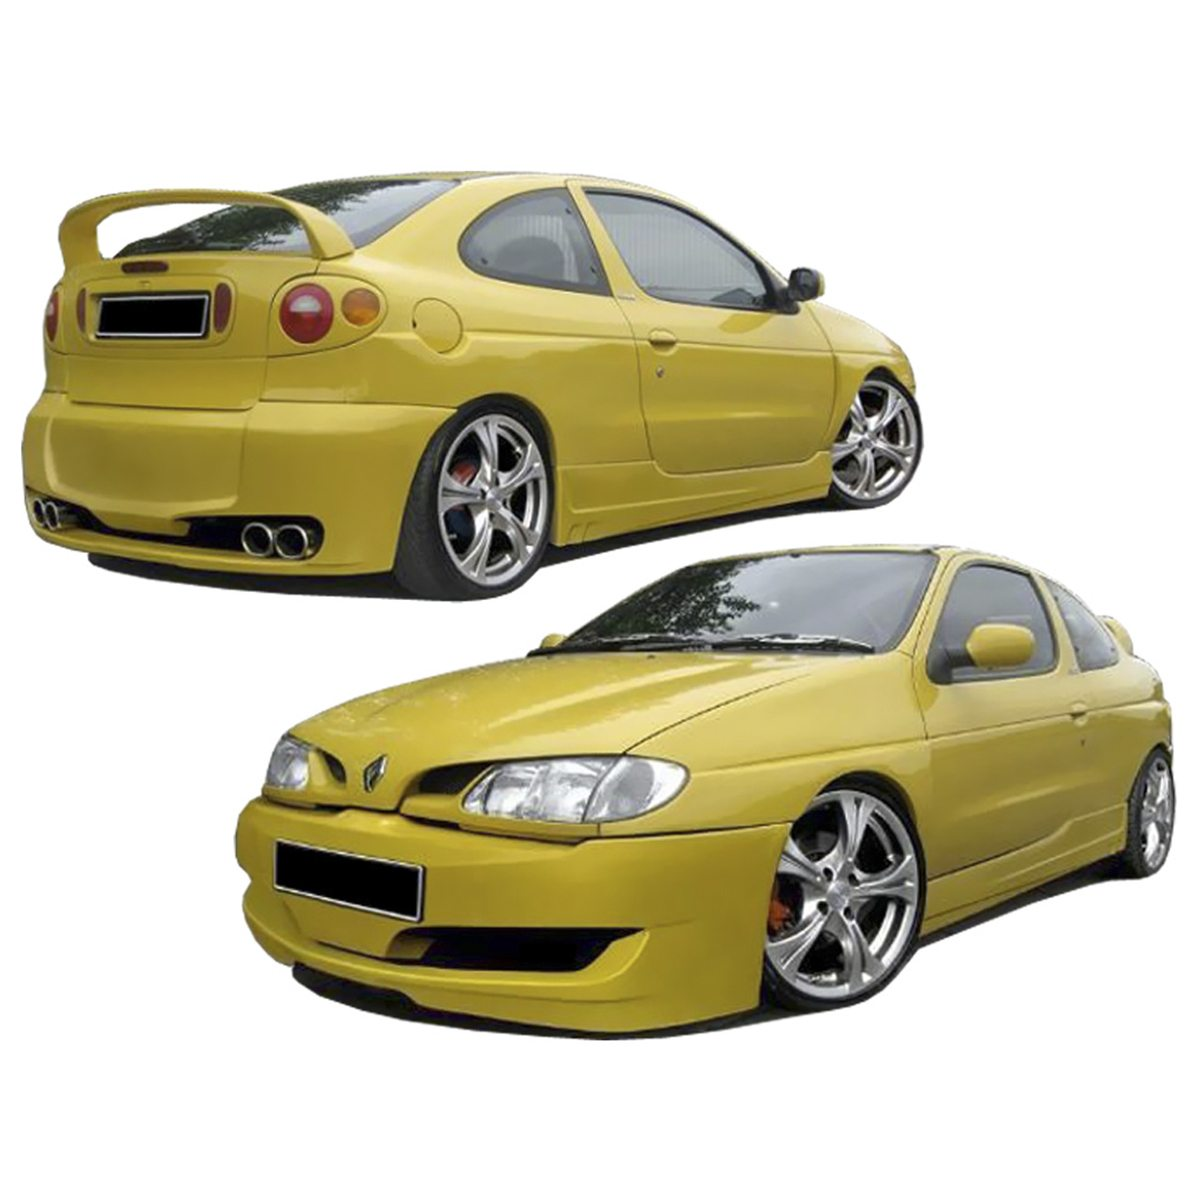 Renault-Megane-96-Coupe-Toxic-KIT-KTS092